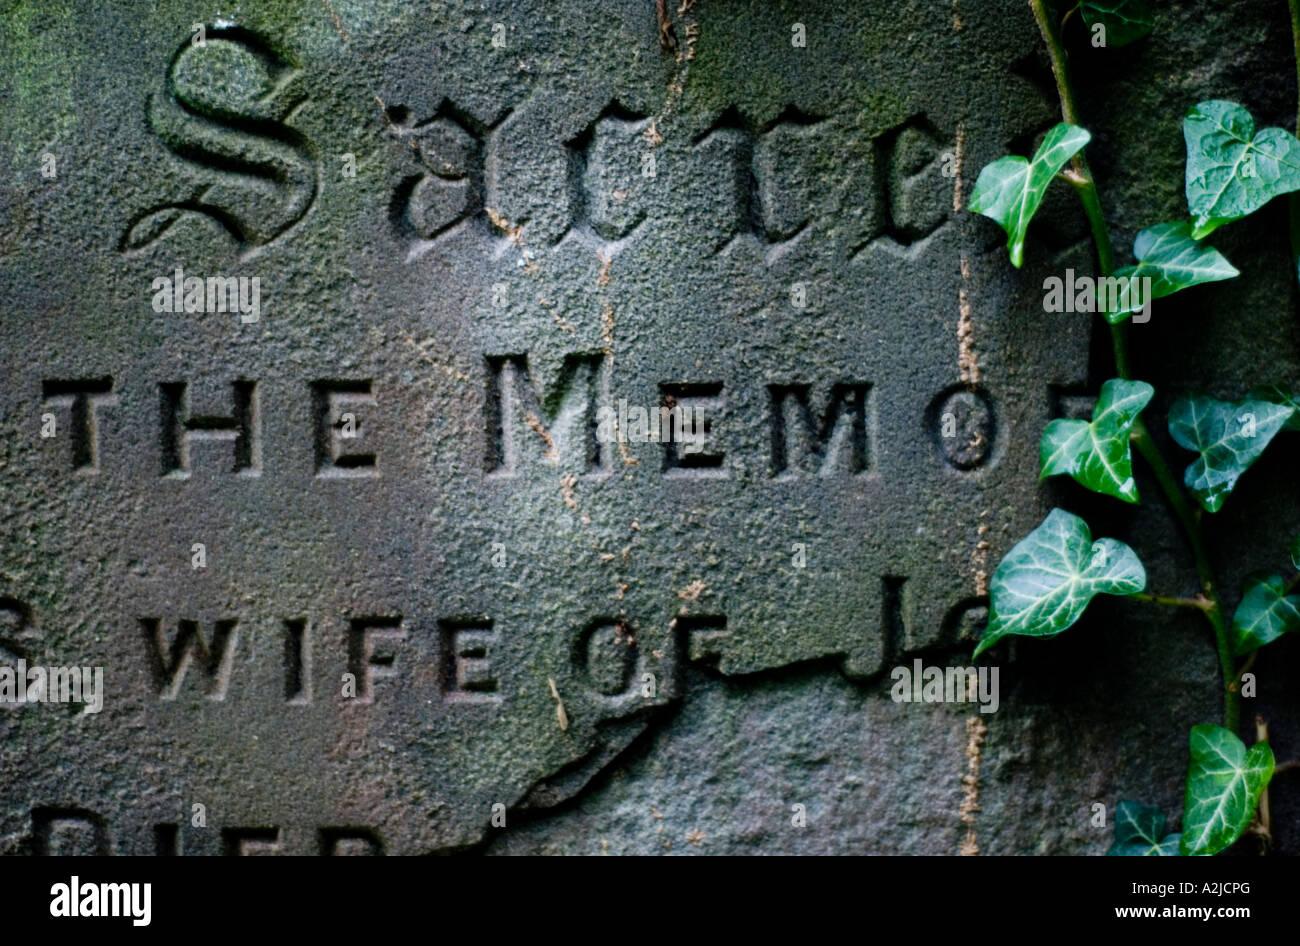 Batheaston Bath  BANES England UK Detail of old gravestone - Stock Image